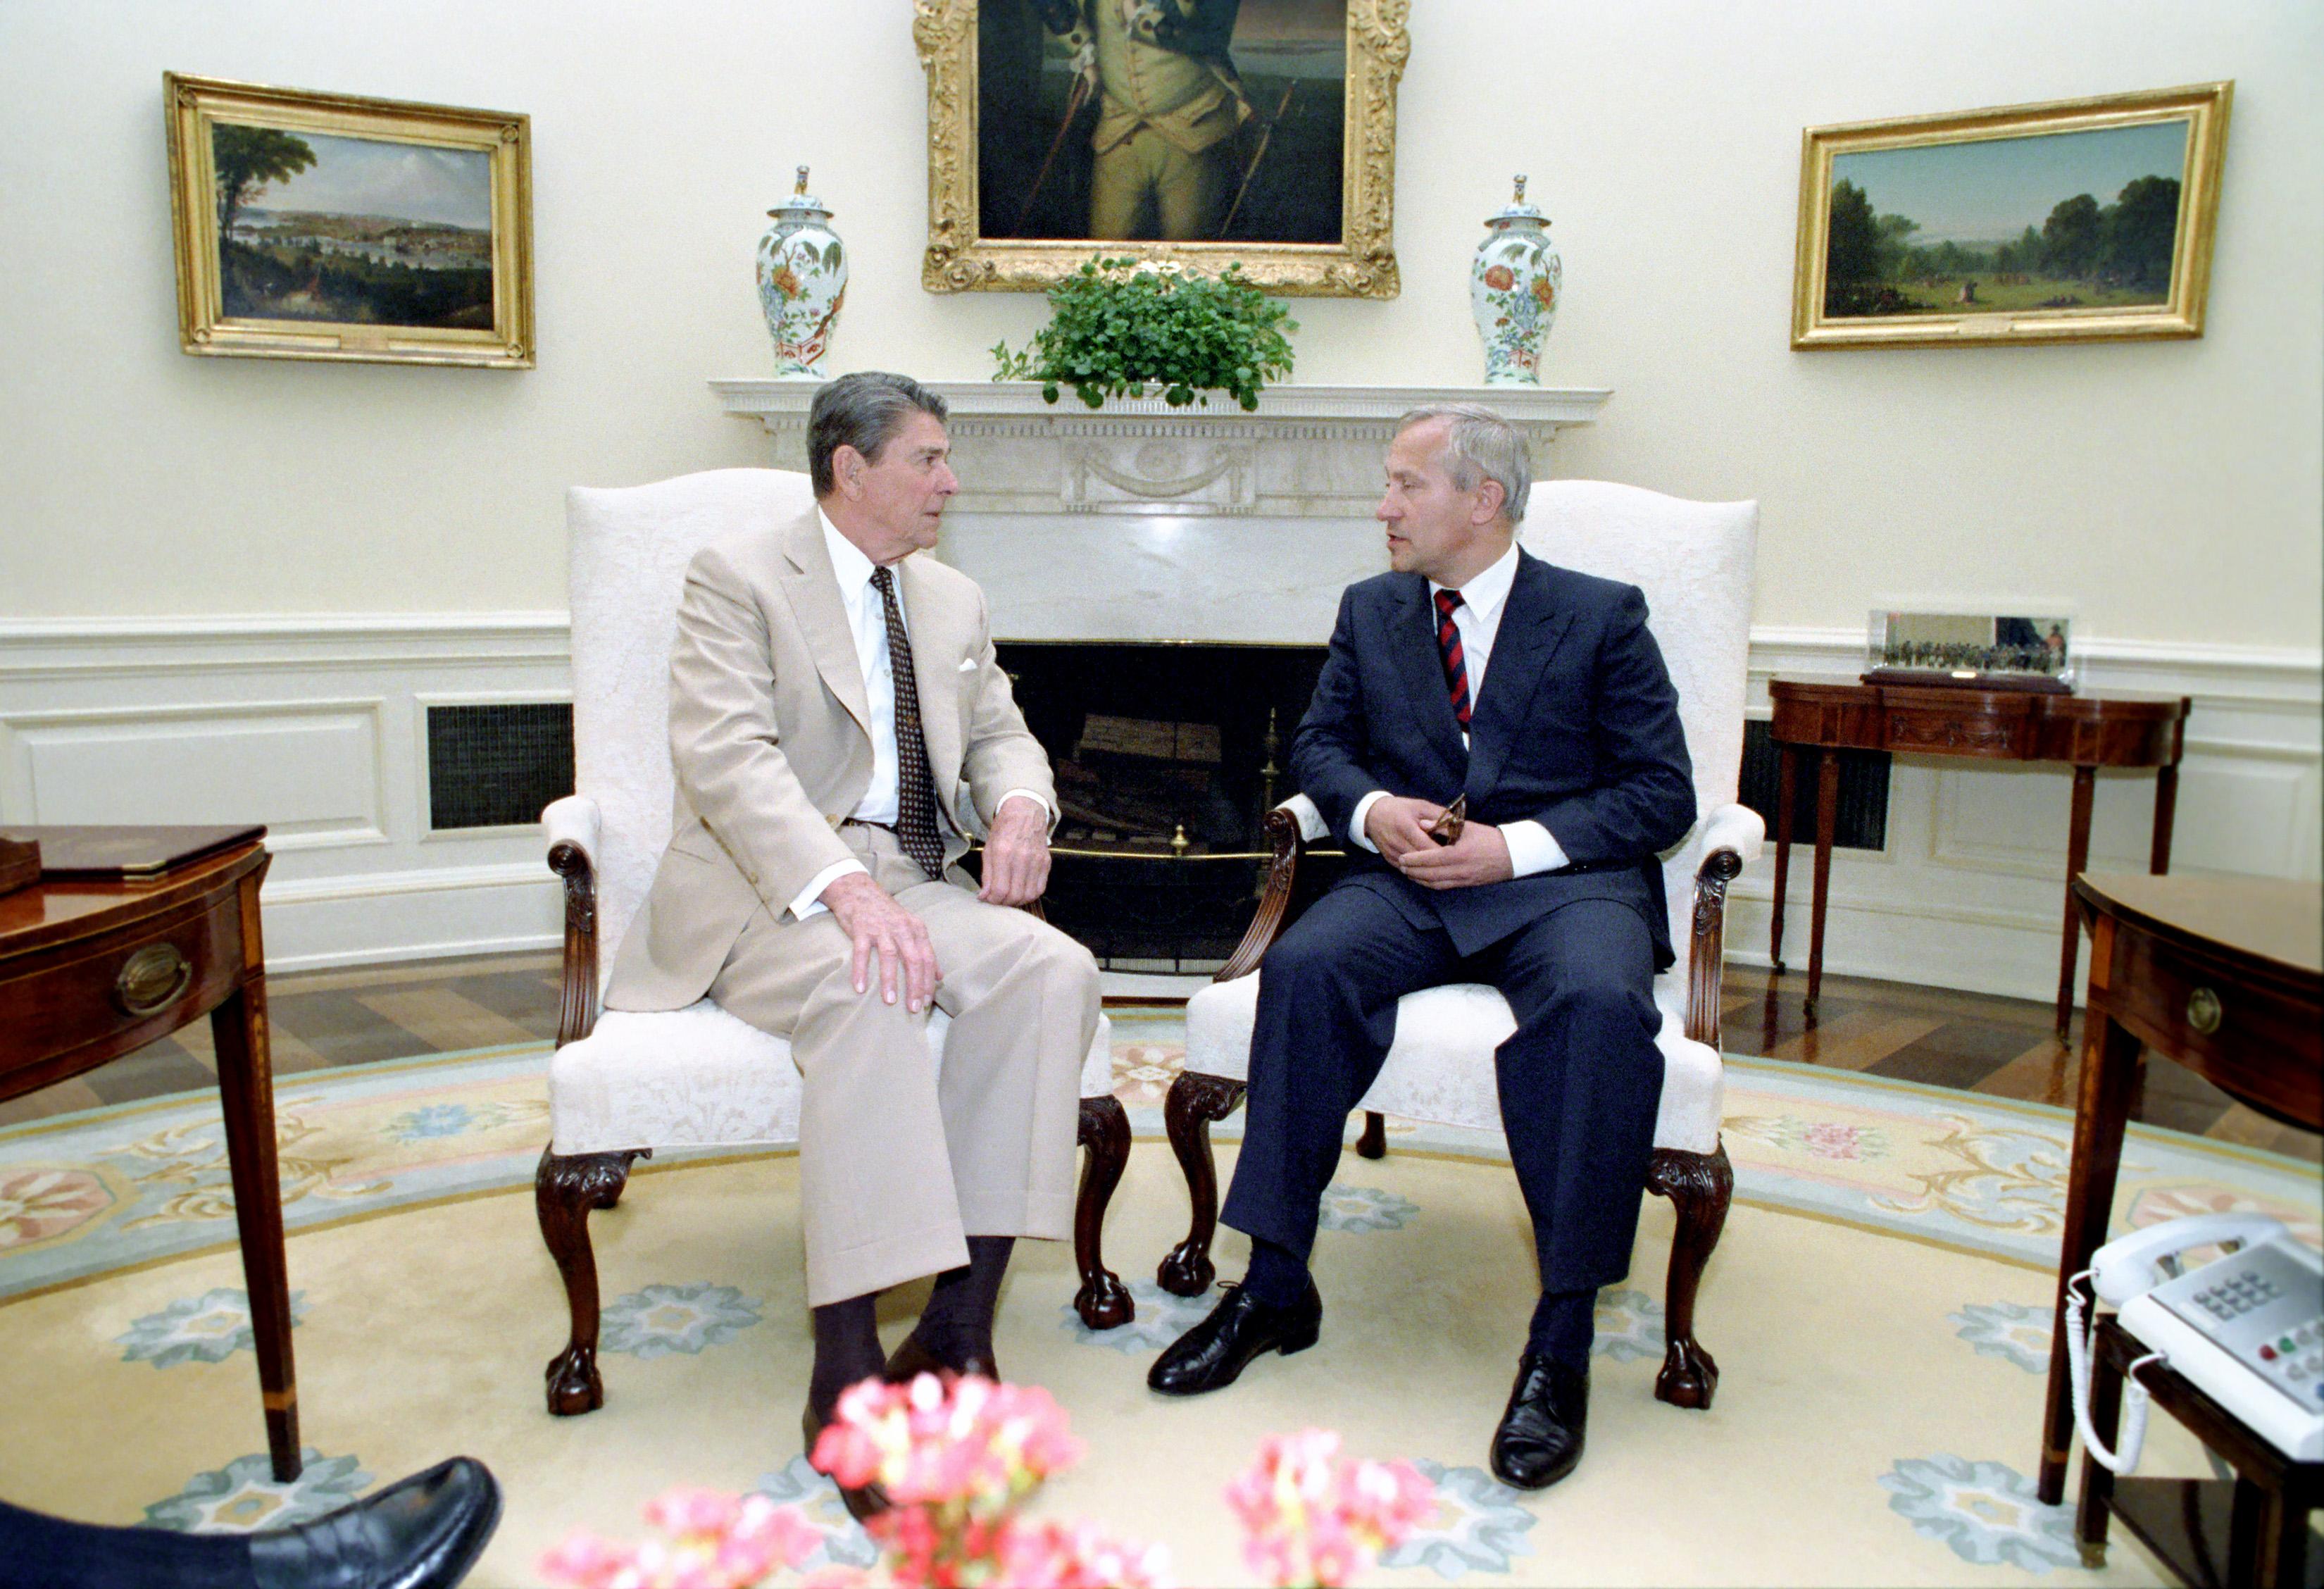 reagan oval office. File:Reagan\u0027s Meeting With Oleg Gordievsky In The Oval Office (15).jpg Reagan